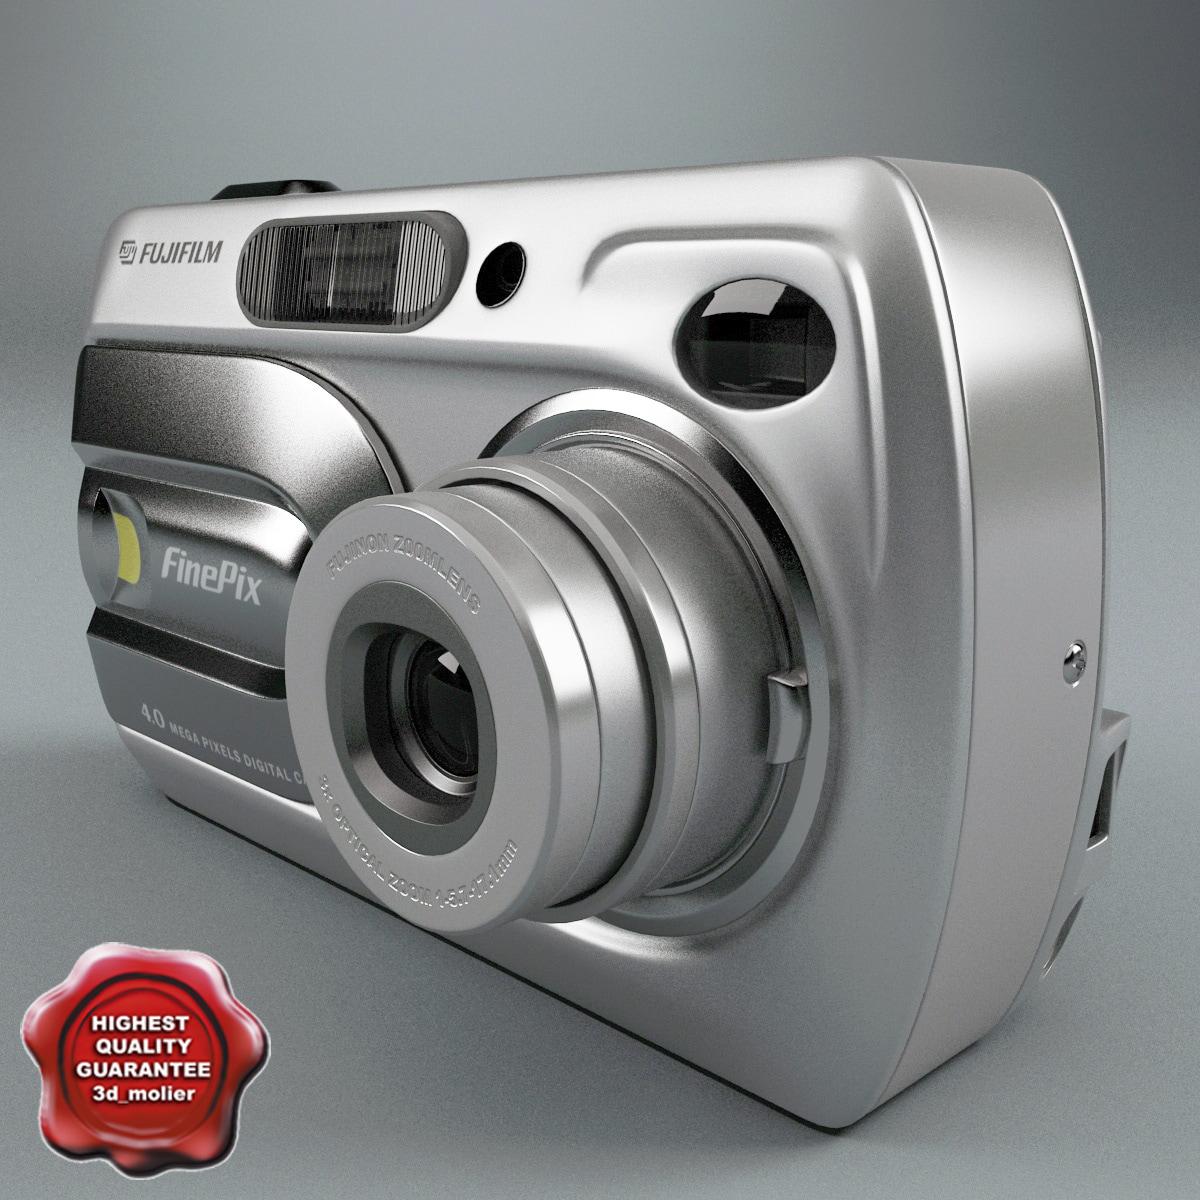 Fujifilm_FinePix_A340_00.jpg